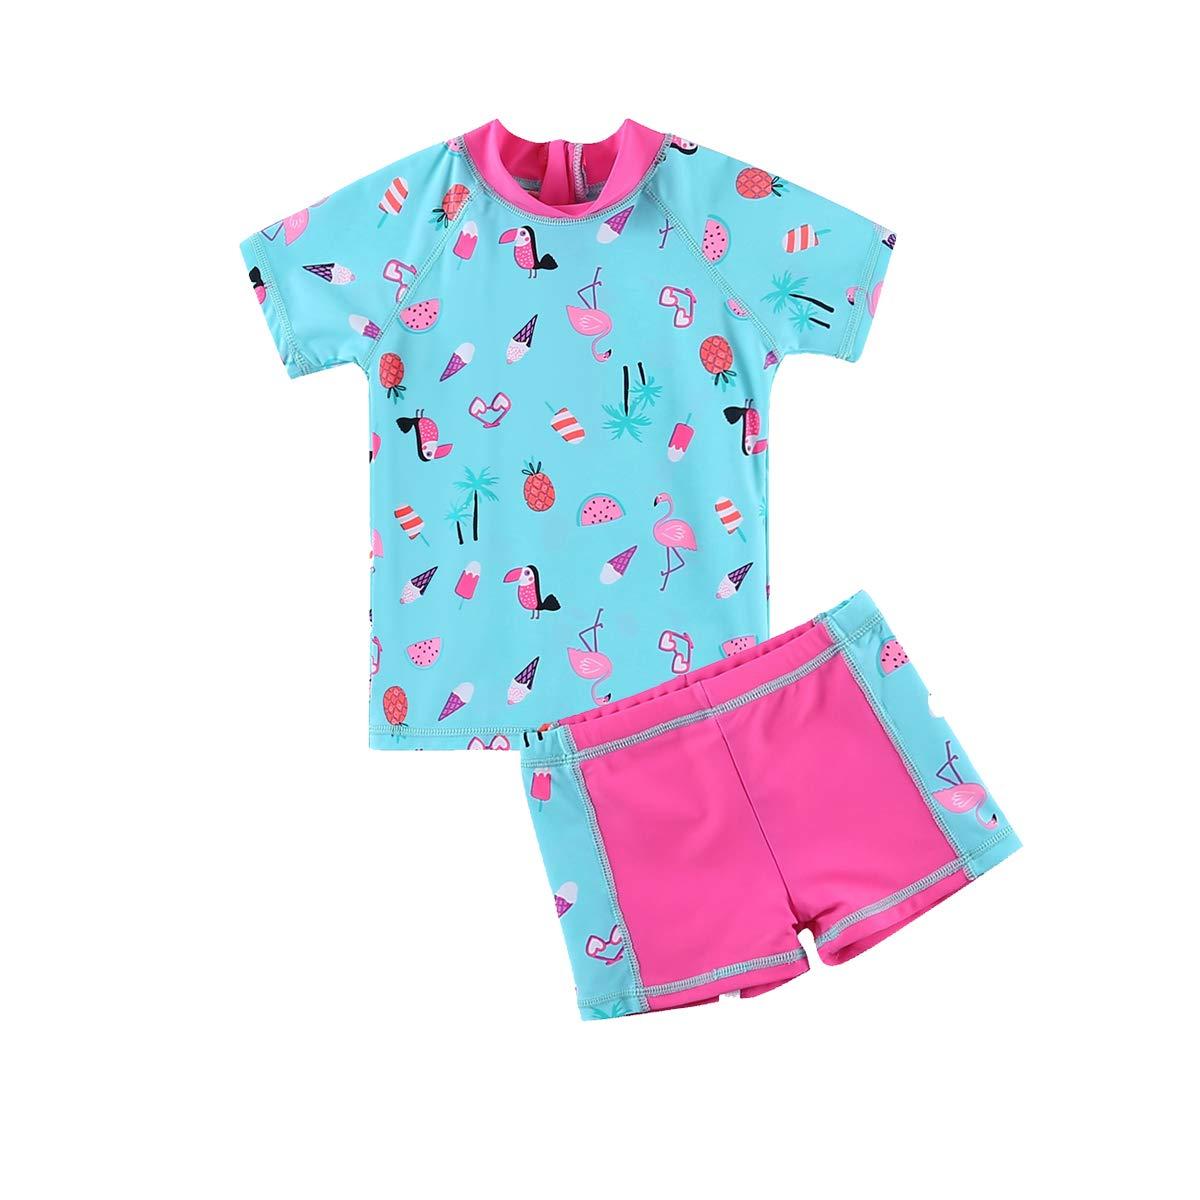 UV Swimsuit Wishere Baby Boy Girl Rash Guard Sets Two-Pieces UPF 50